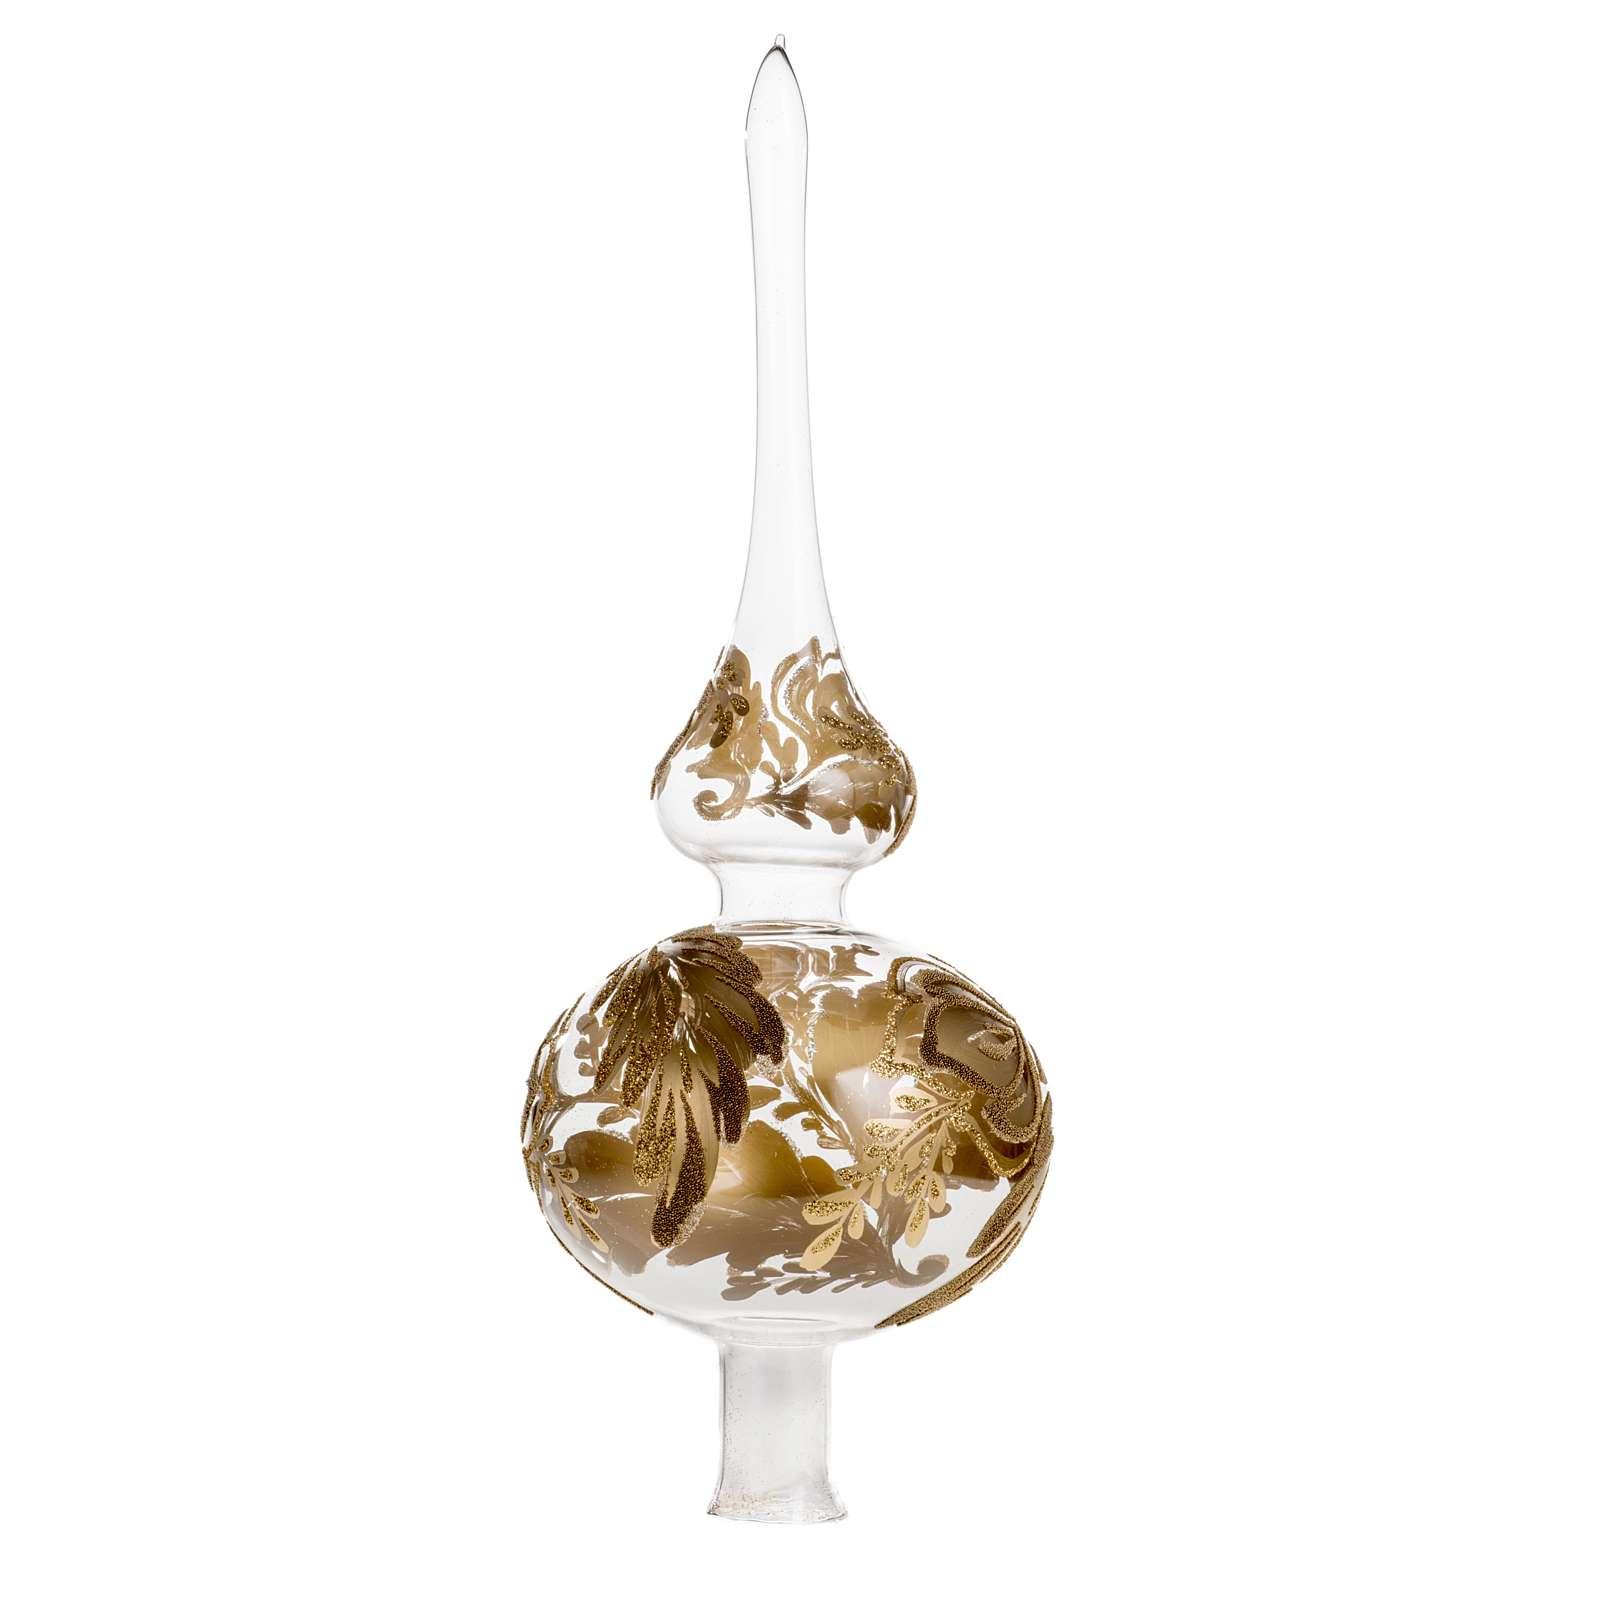 Adorno navidad forma punta, vidrio transparente pintado a mano 4